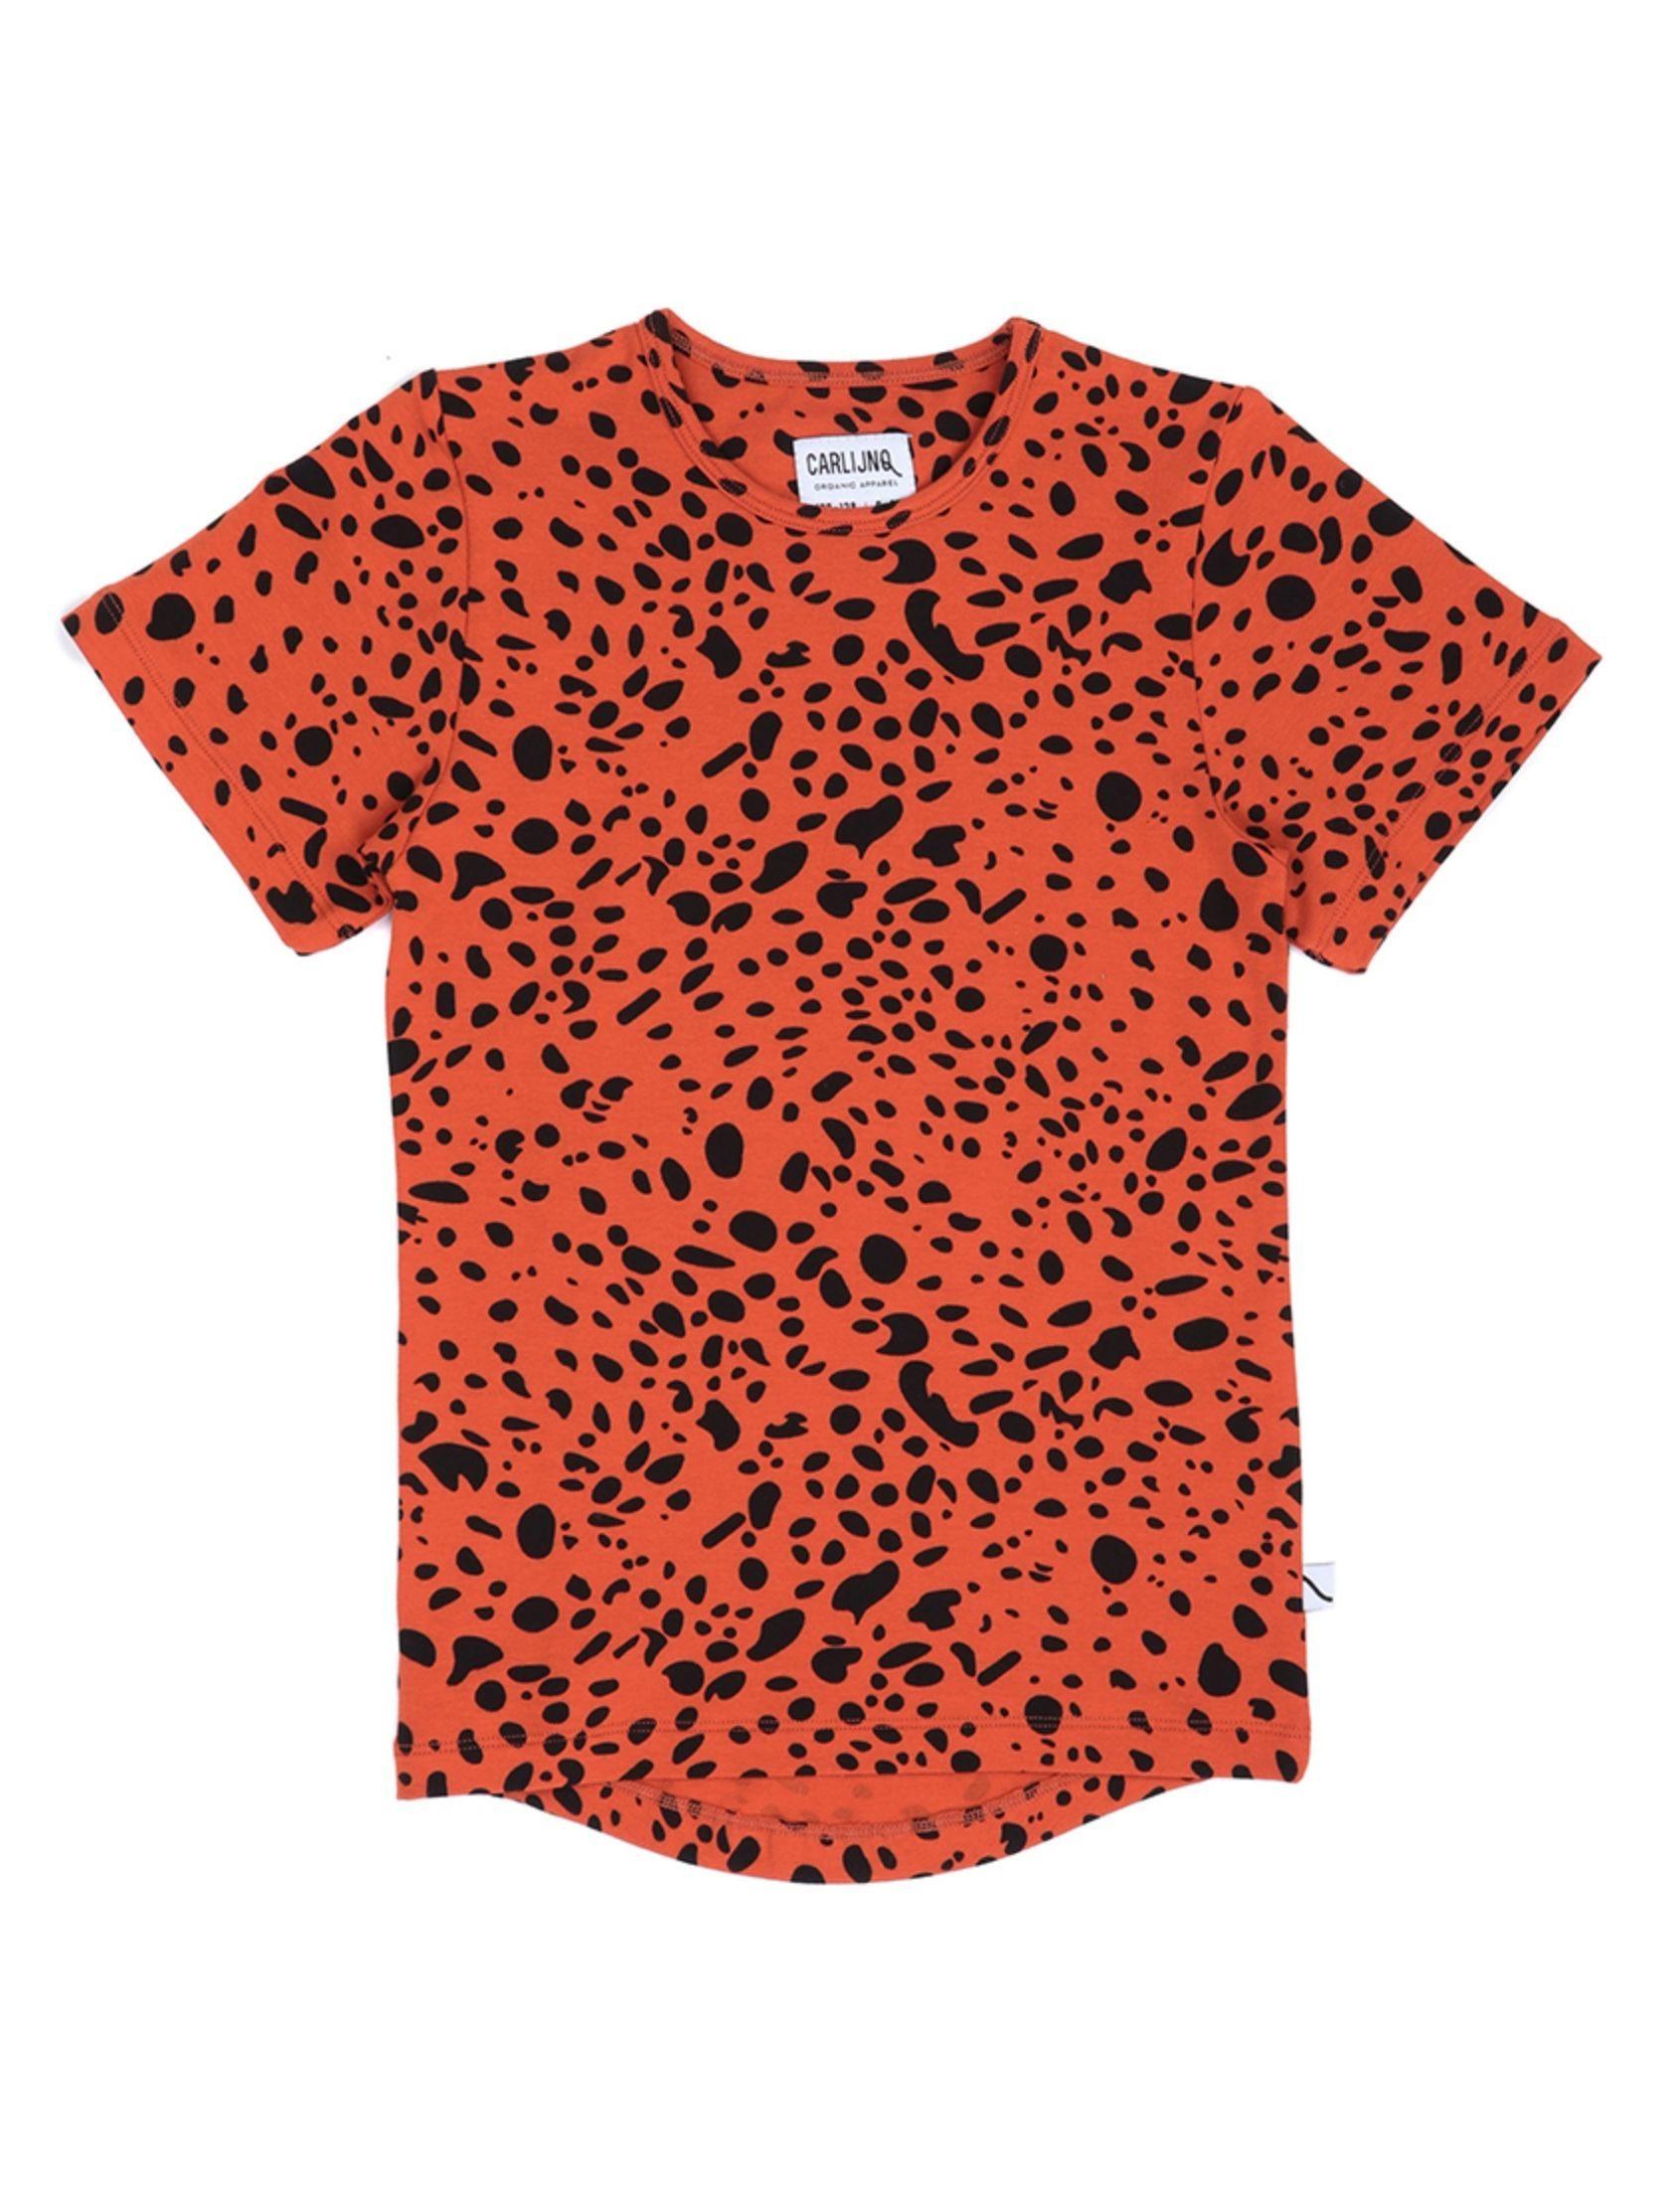 camiseta infantil con estampado animal print de carlijnq